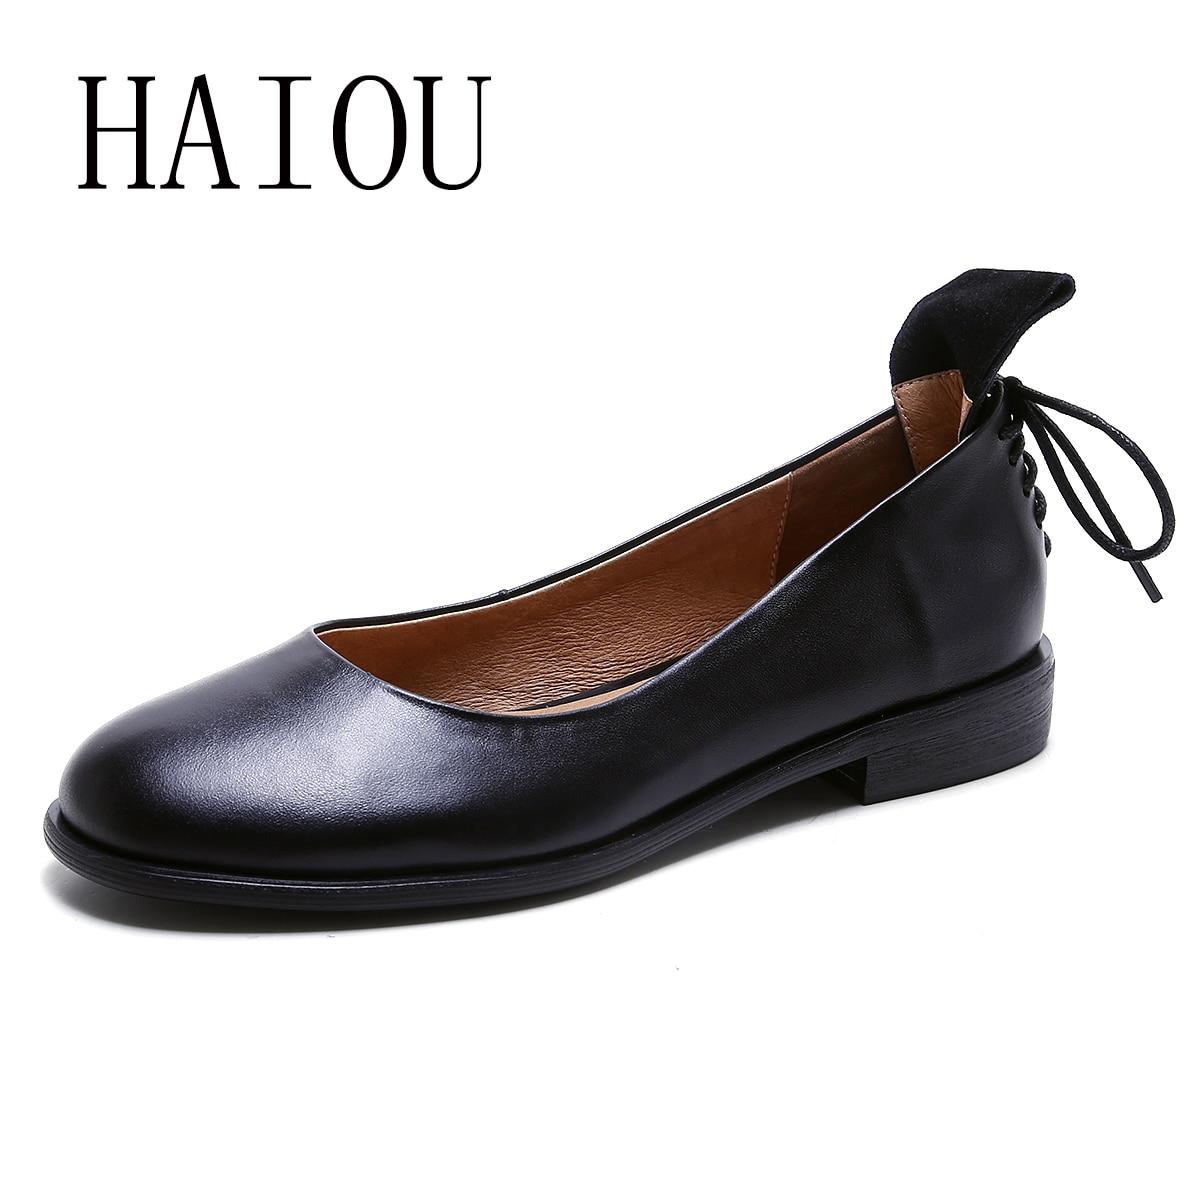 2017 Women Black Shoes Slip on Woman Genuine Leather Flat Shoes Fashion Handmade Leather Loafers Female Casual Shoes Women Flats цена и фото